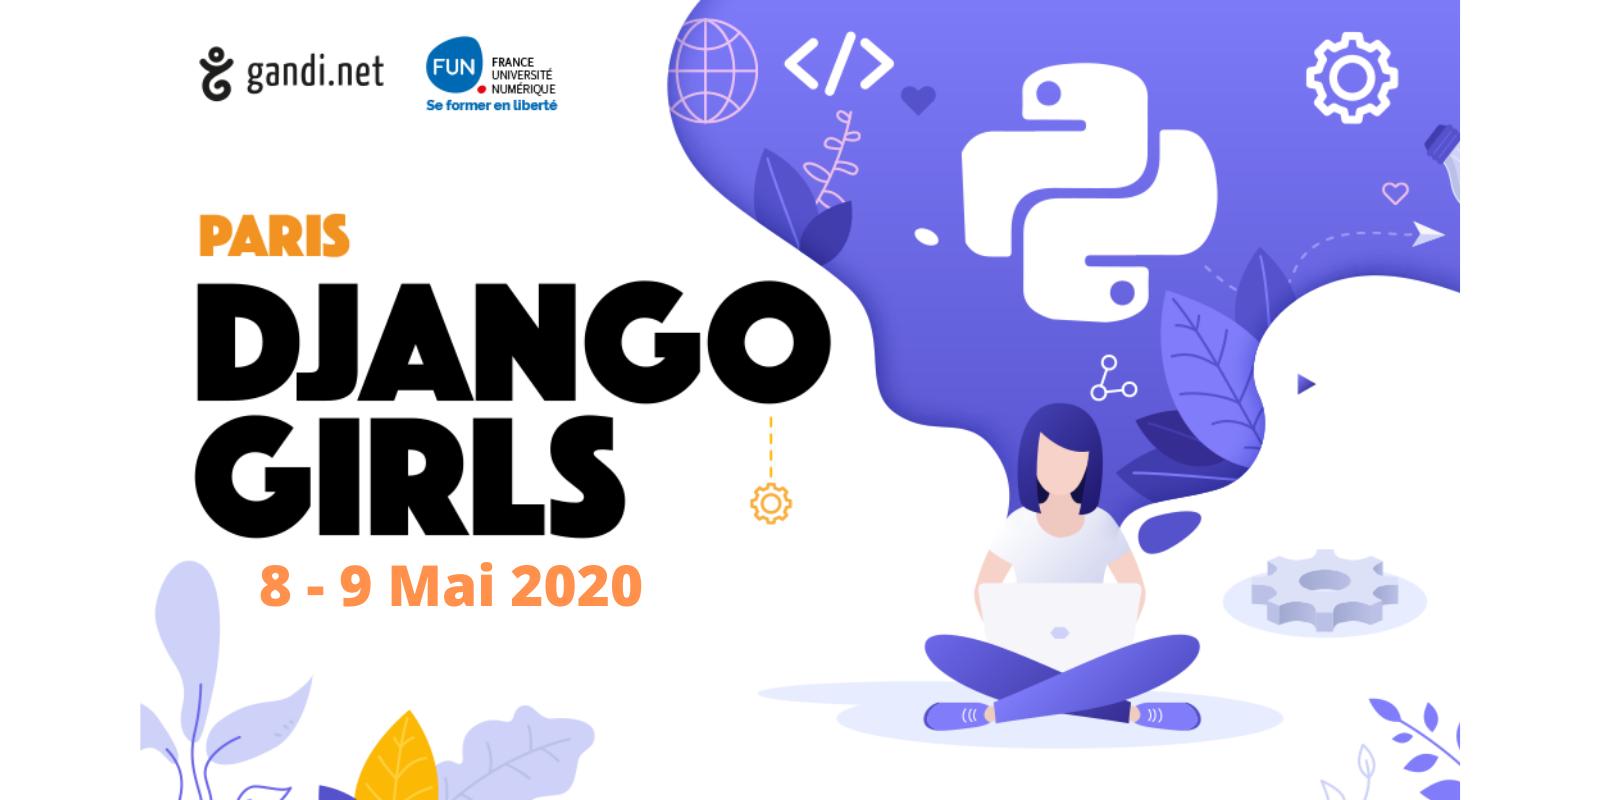 Apprenez à coder avec la Django Girls Paris